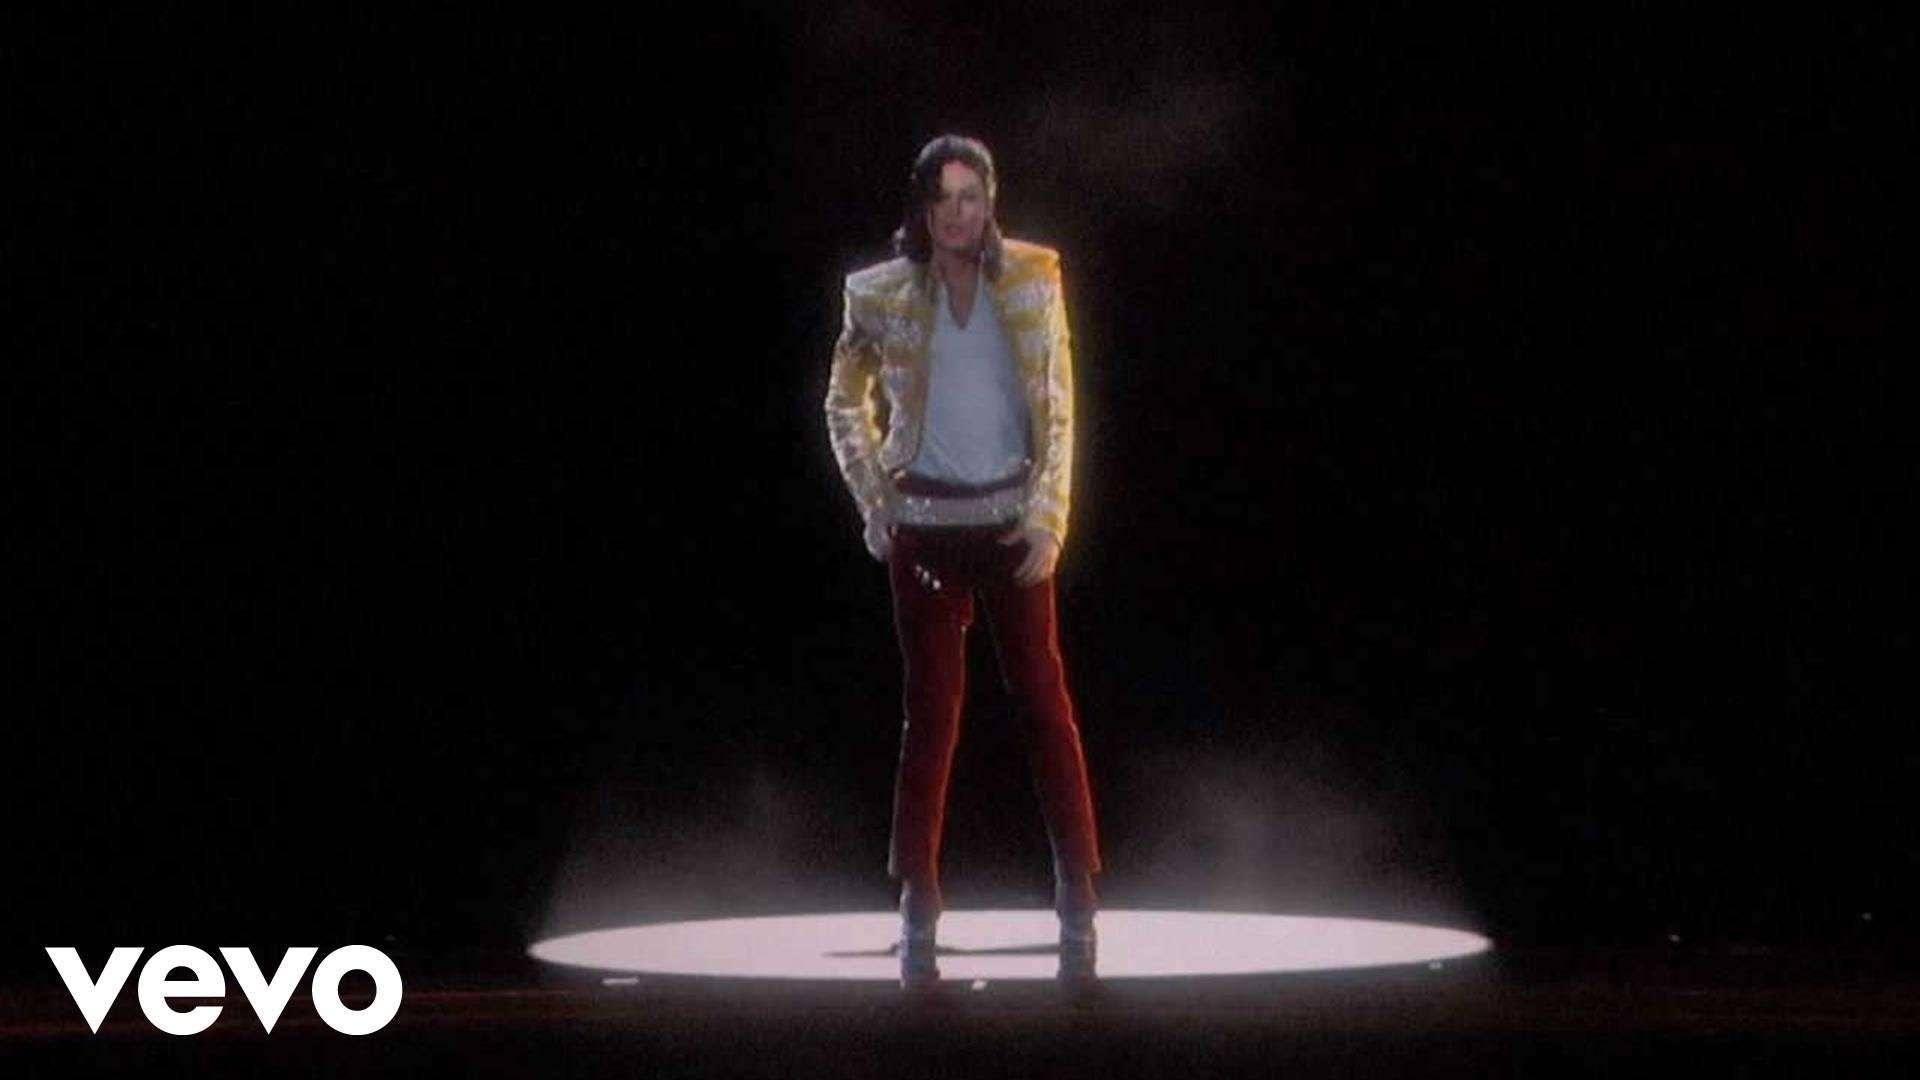 Michael Jackson「Slave To The Rhythm」(「アルバム「Xscape」曲)